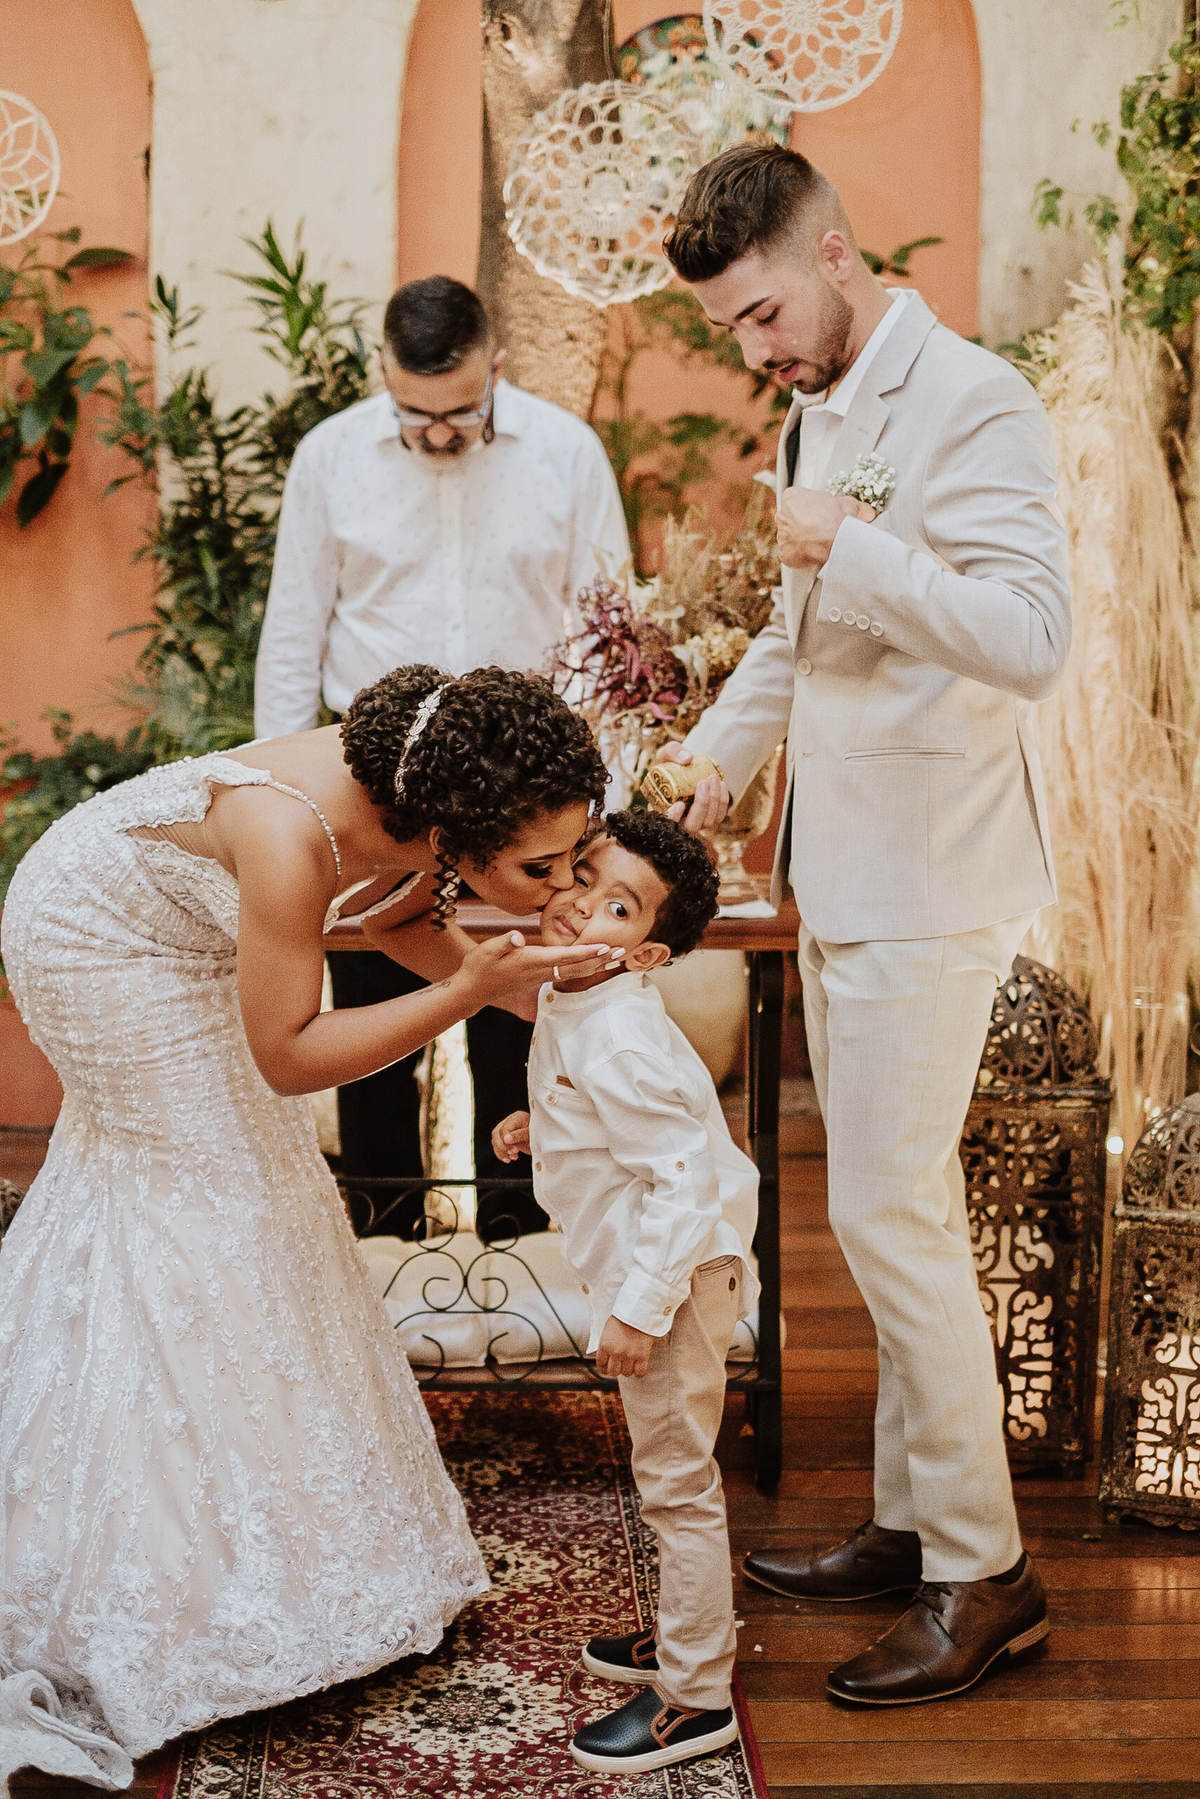 casamentos intimistas elopement wedding noivos no altar ideias para casar decoracao de casamento cerimonias intimistas pagens